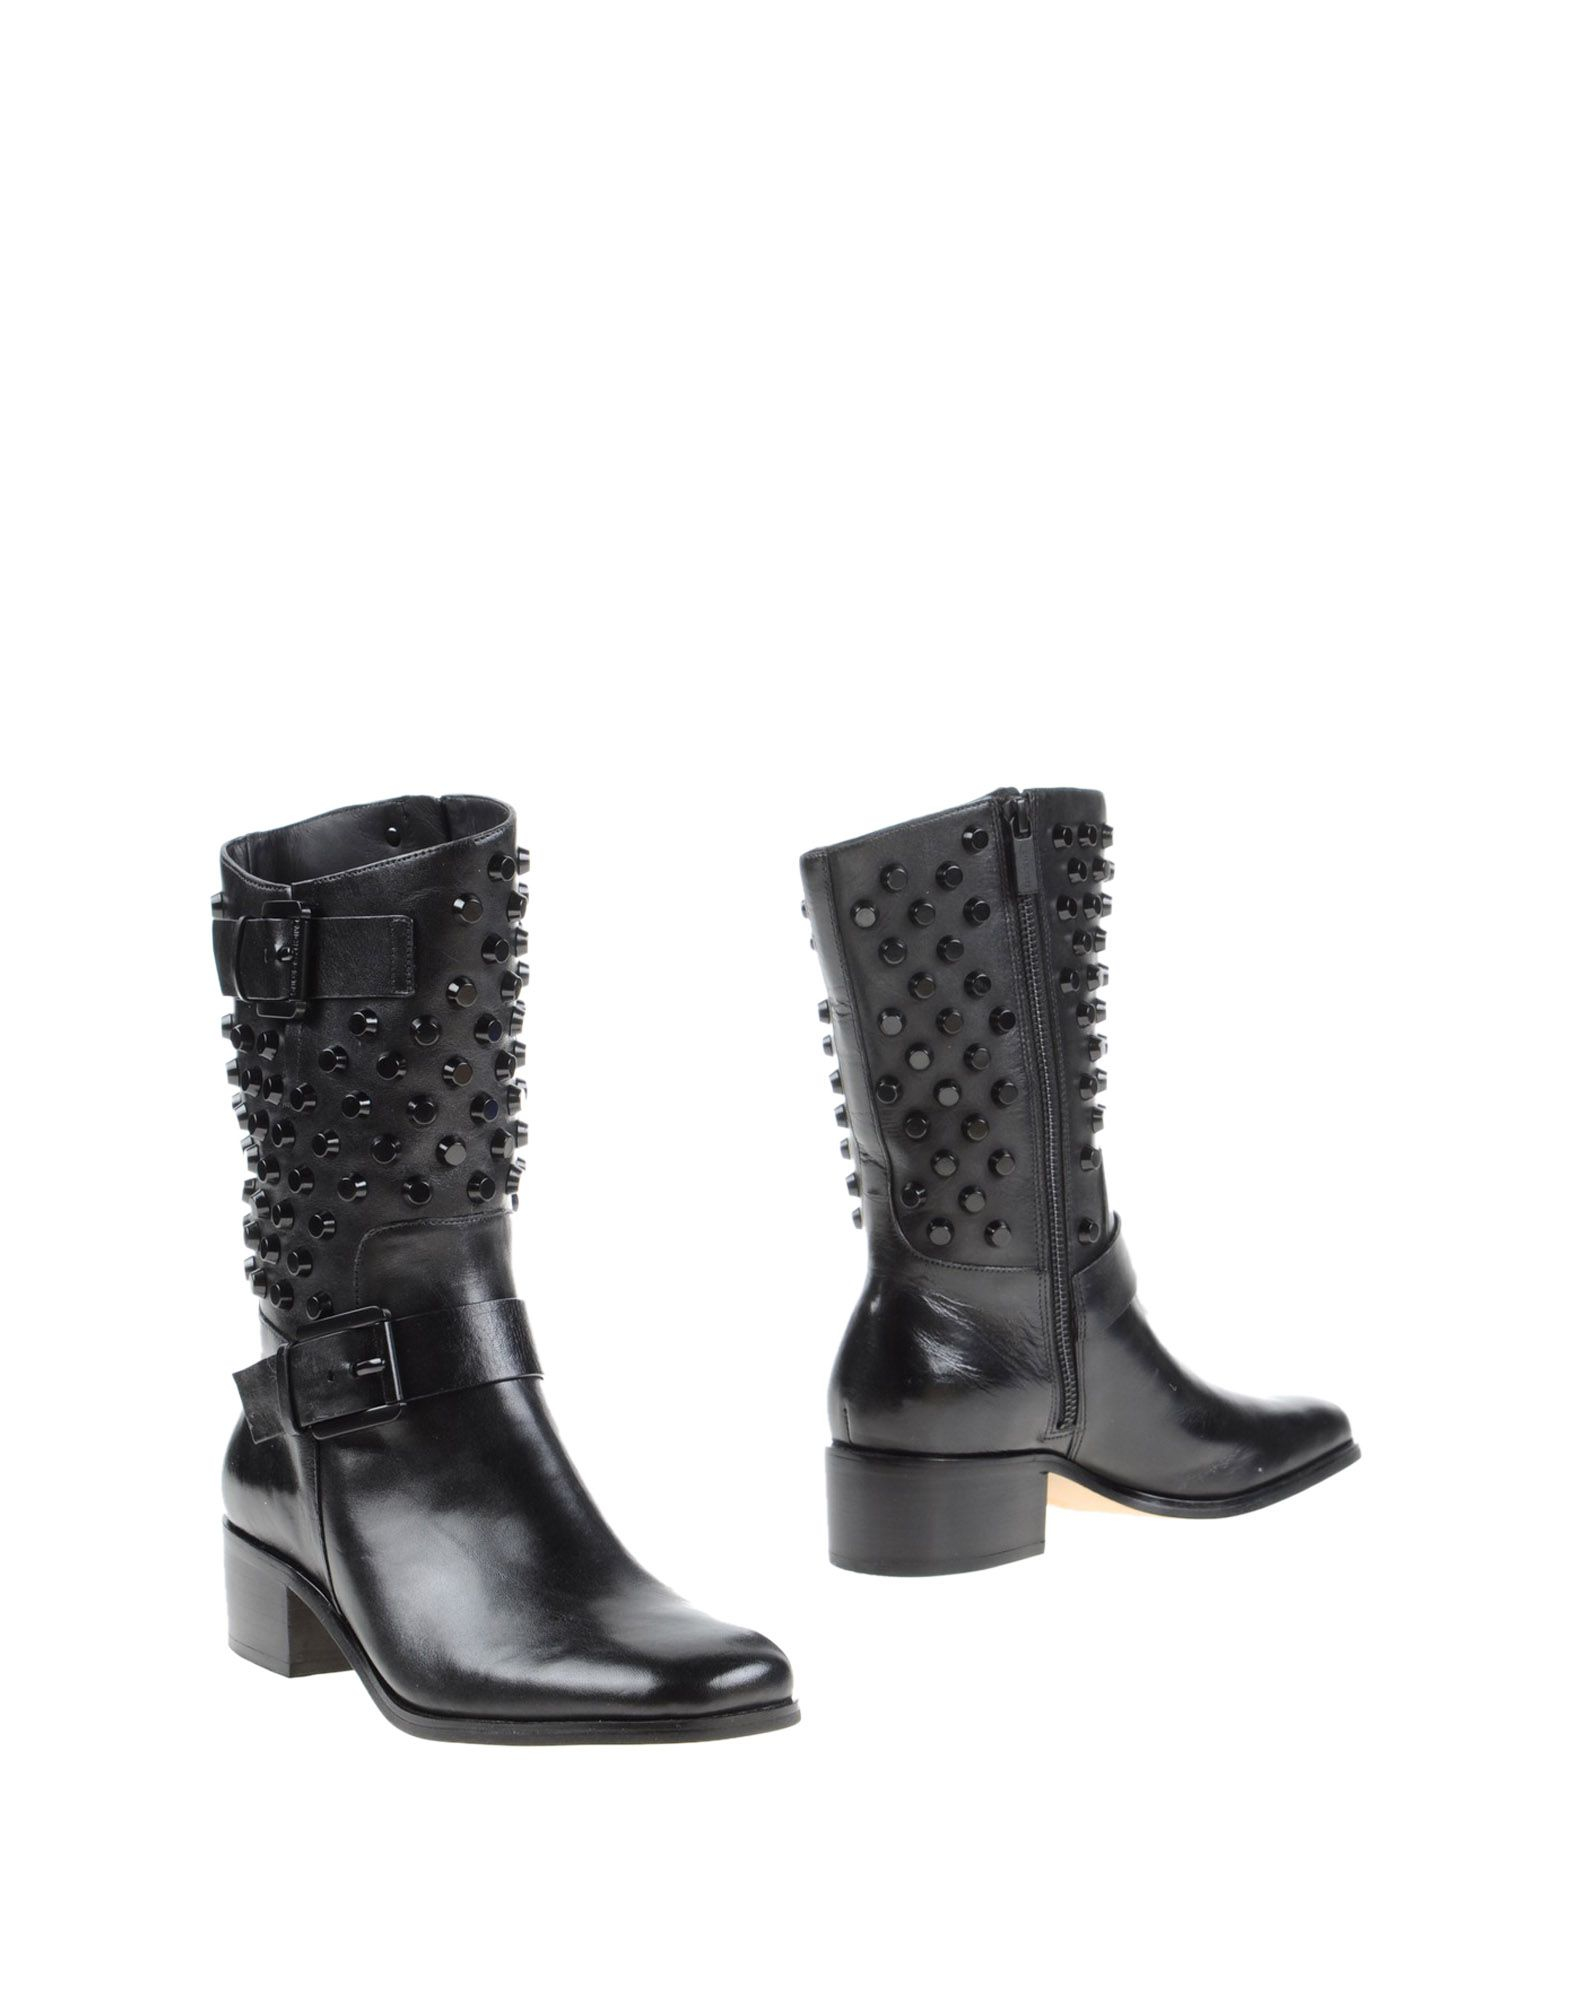 lyst michael michael kors ankle boots in black. Black Bedroom Furniture Sets. Home Design Ideas